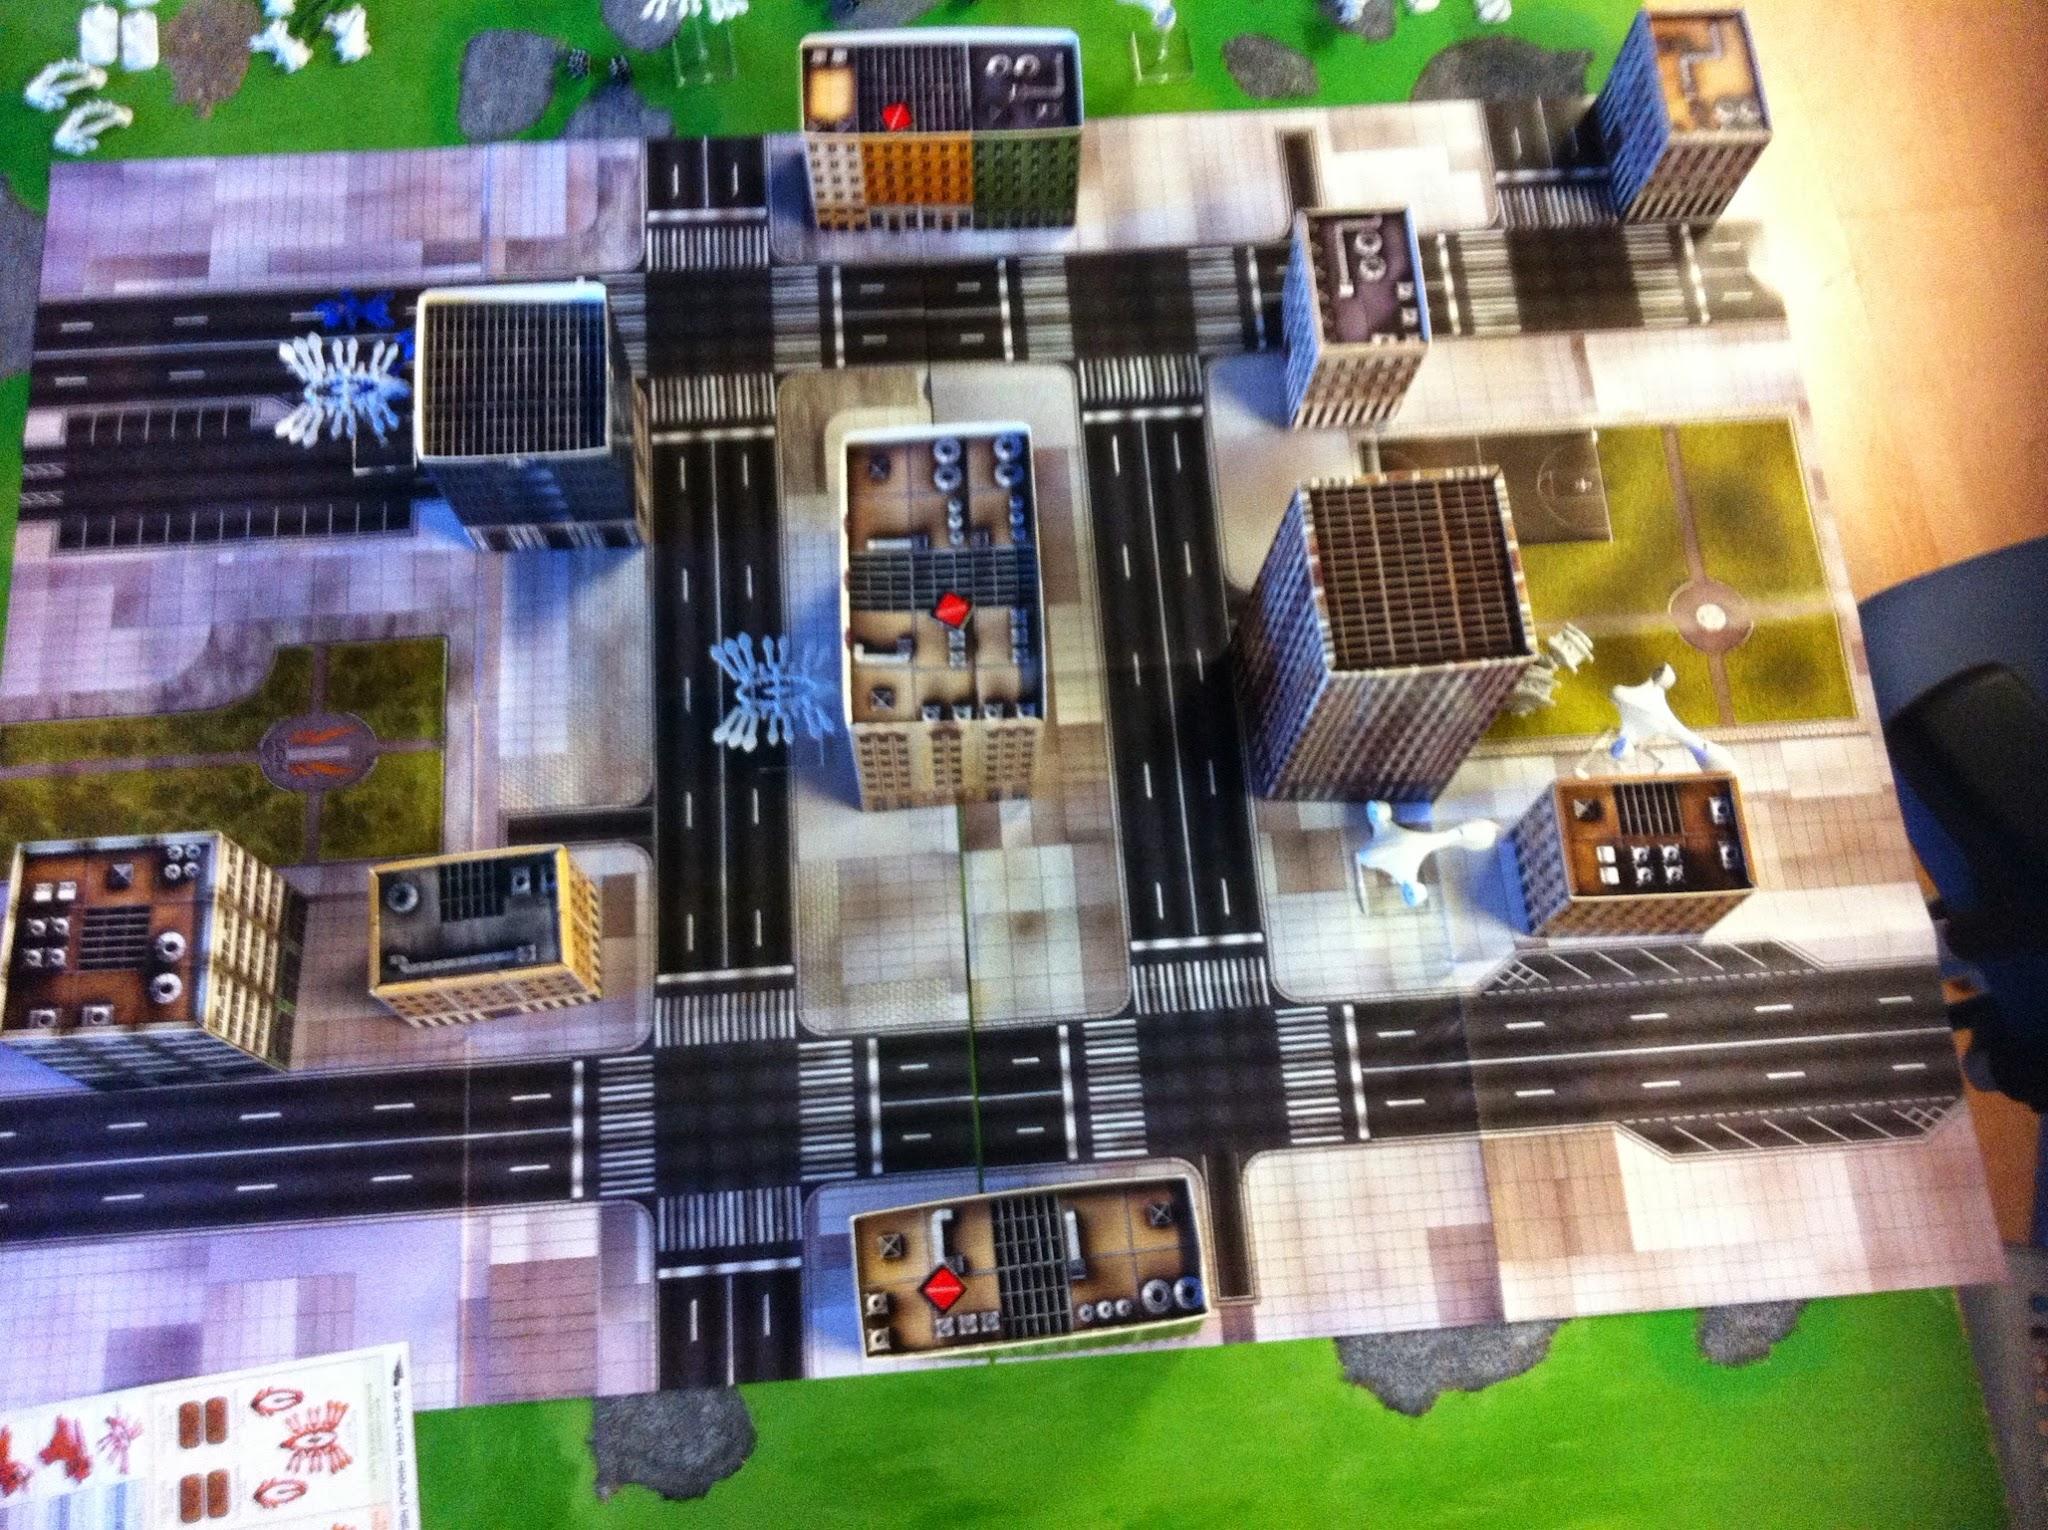 Dropzone Commander, Hawk Wargames, Shaltari, PHR, Shaltari vs PHR, Crying Grumpies